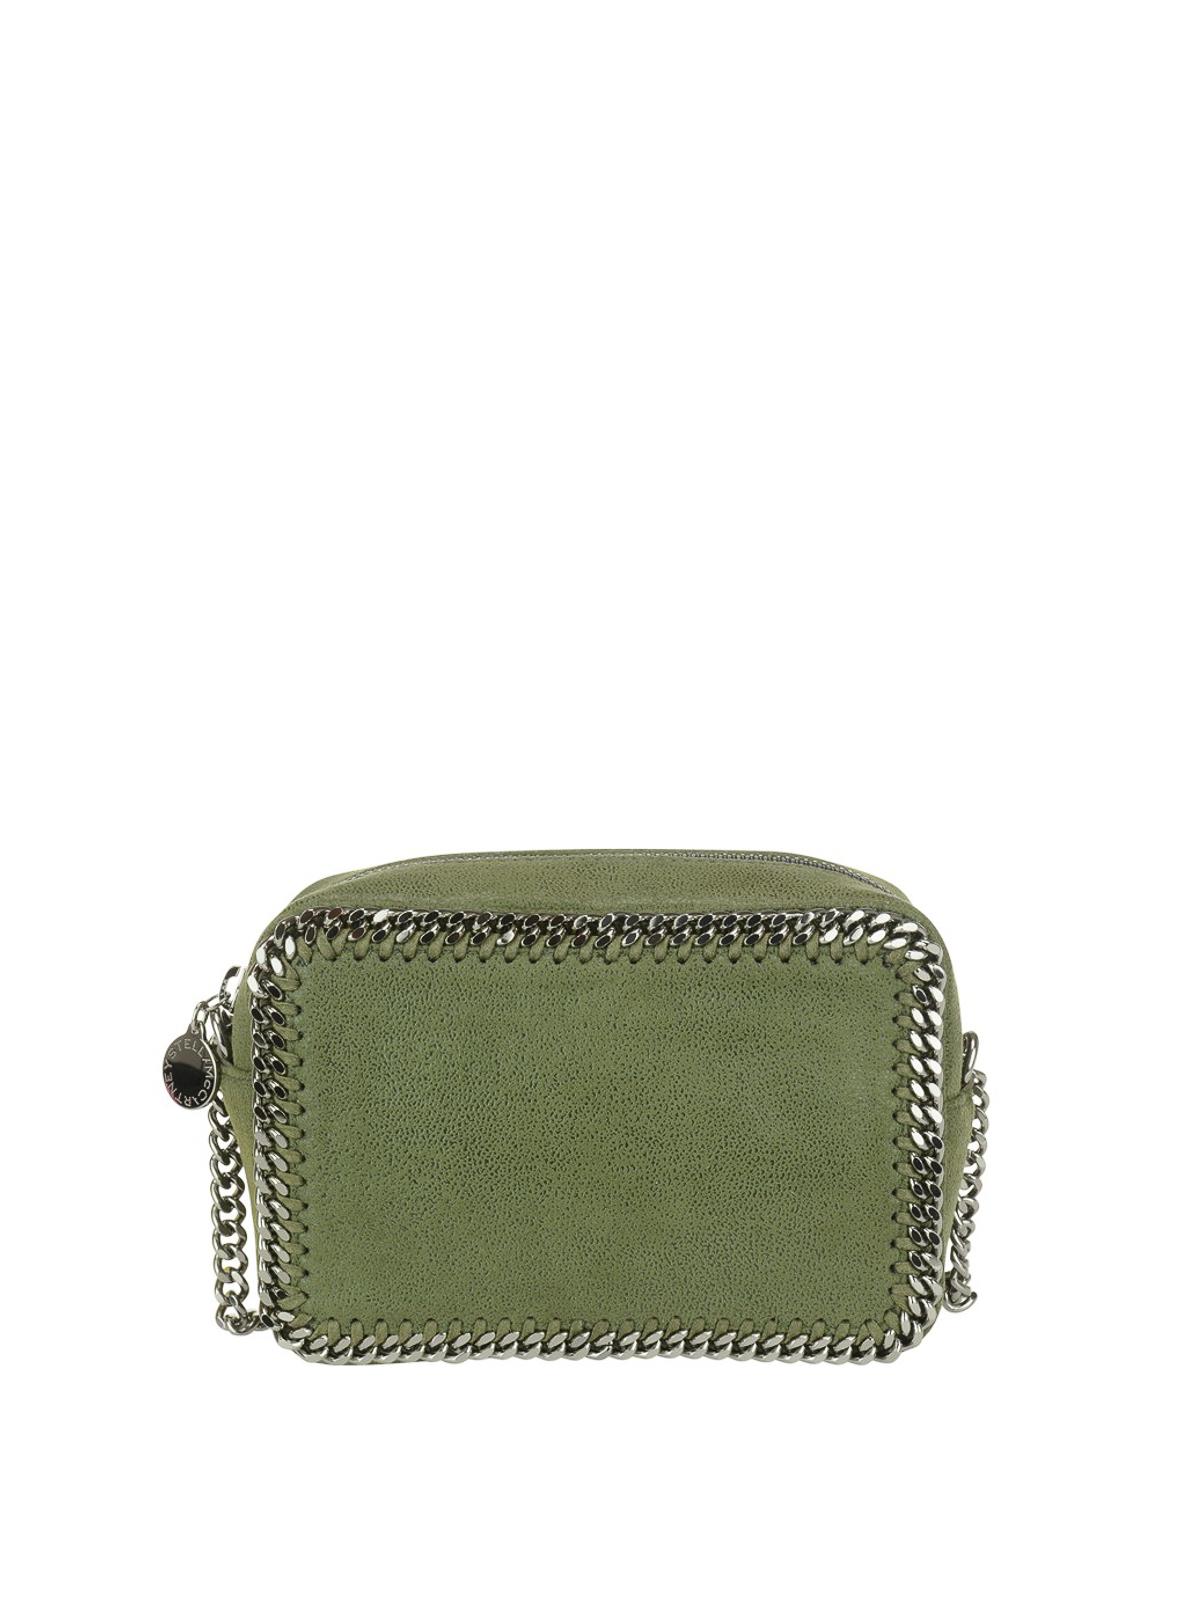 e3b687aa62 Stella Mccartney - Falabella olive green crossbody bag - cross body ...